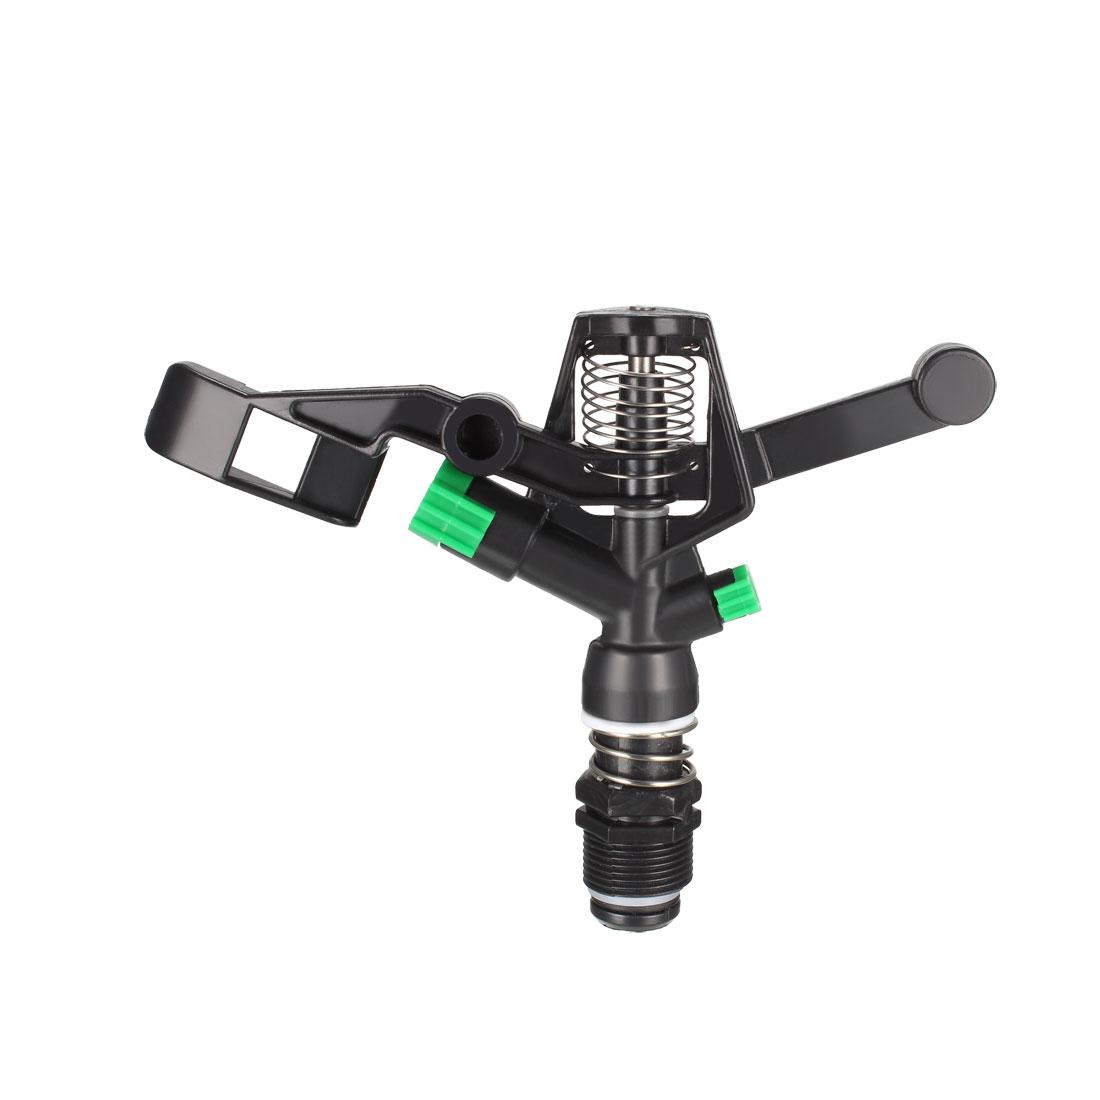 Rotate Rocker Arm Sprinkler, 3/4BSPF Zinc Alloy Spray Nozzle for Irrigation